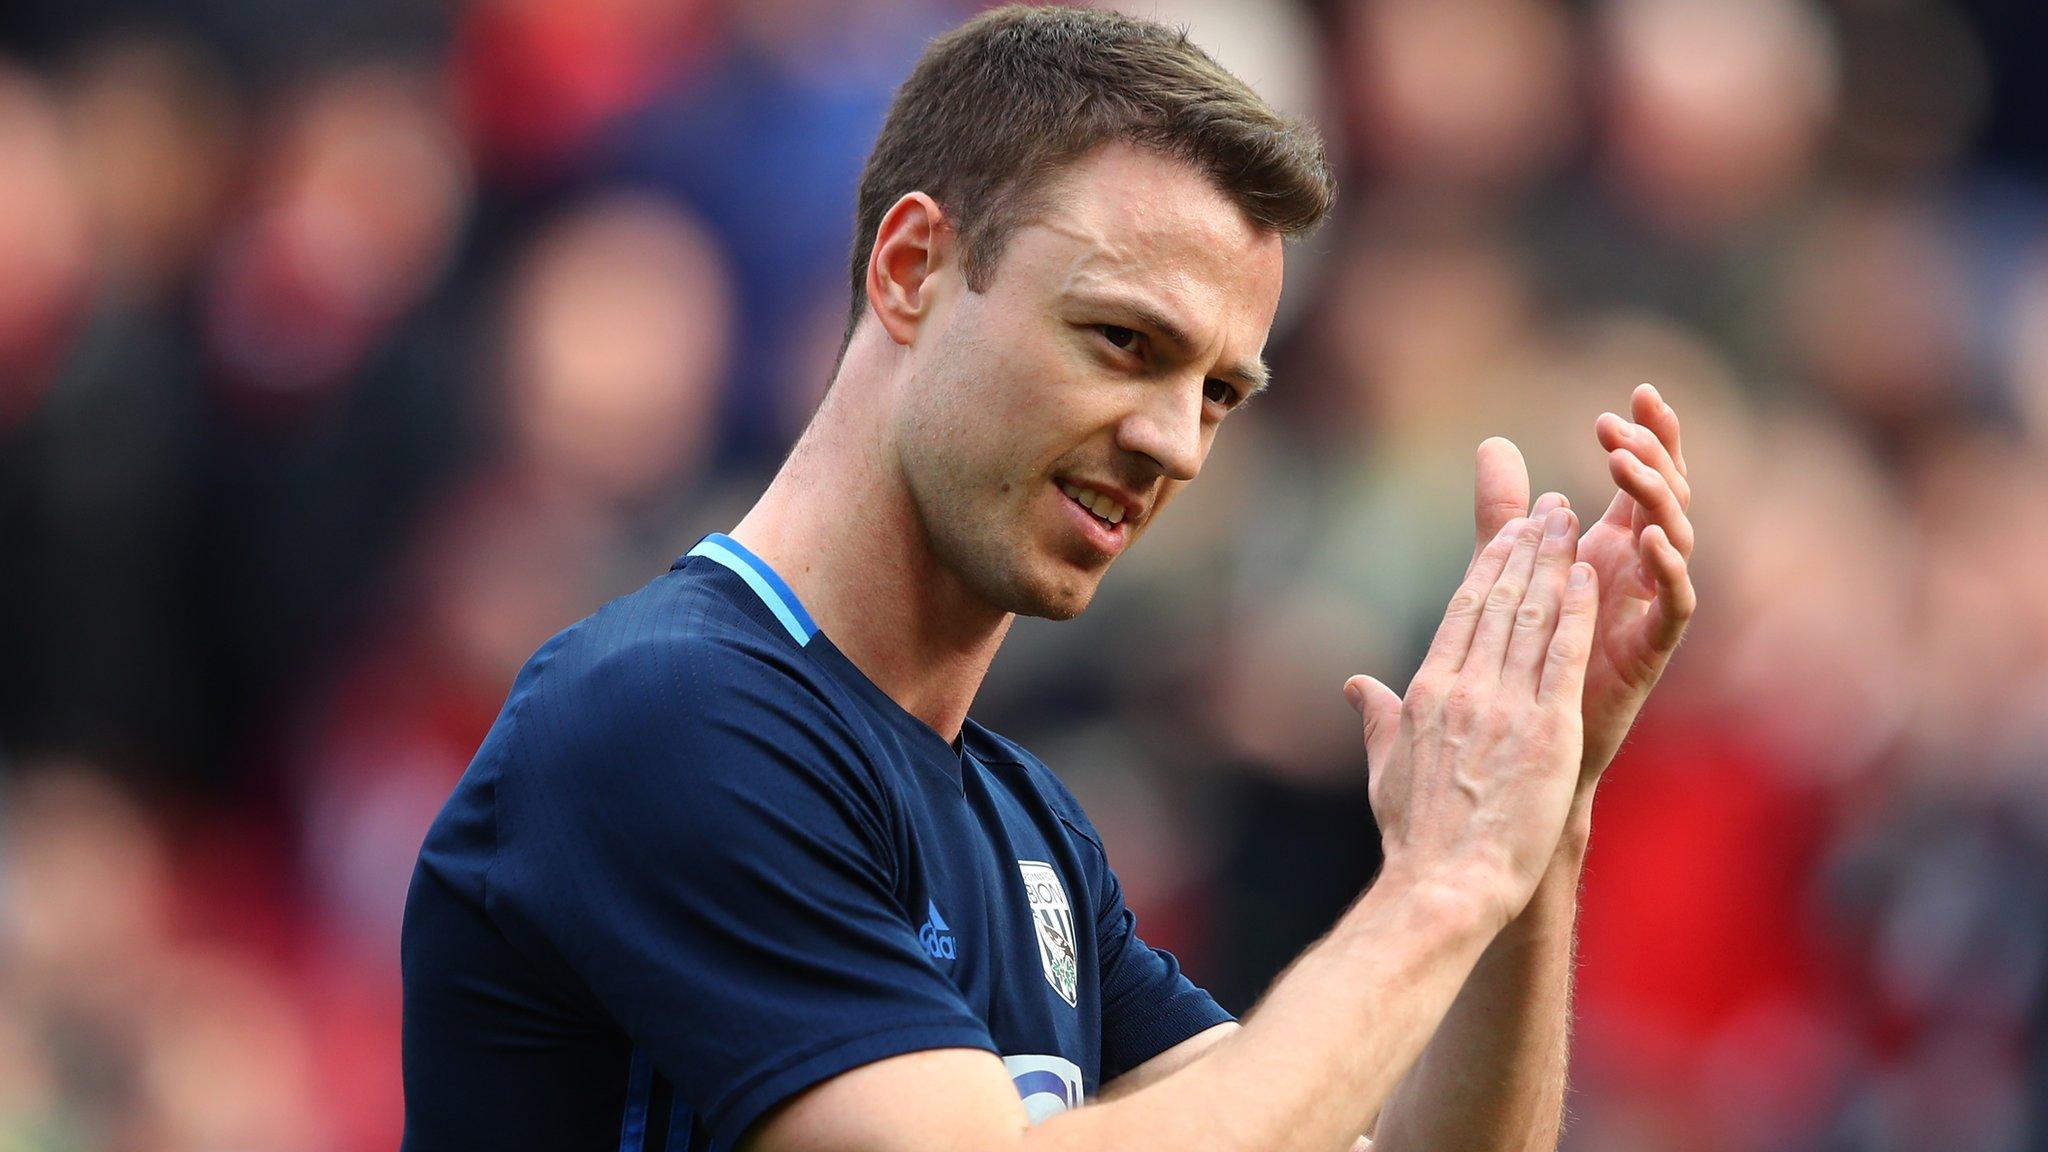 Gossip: Man United consider bringing back Evans